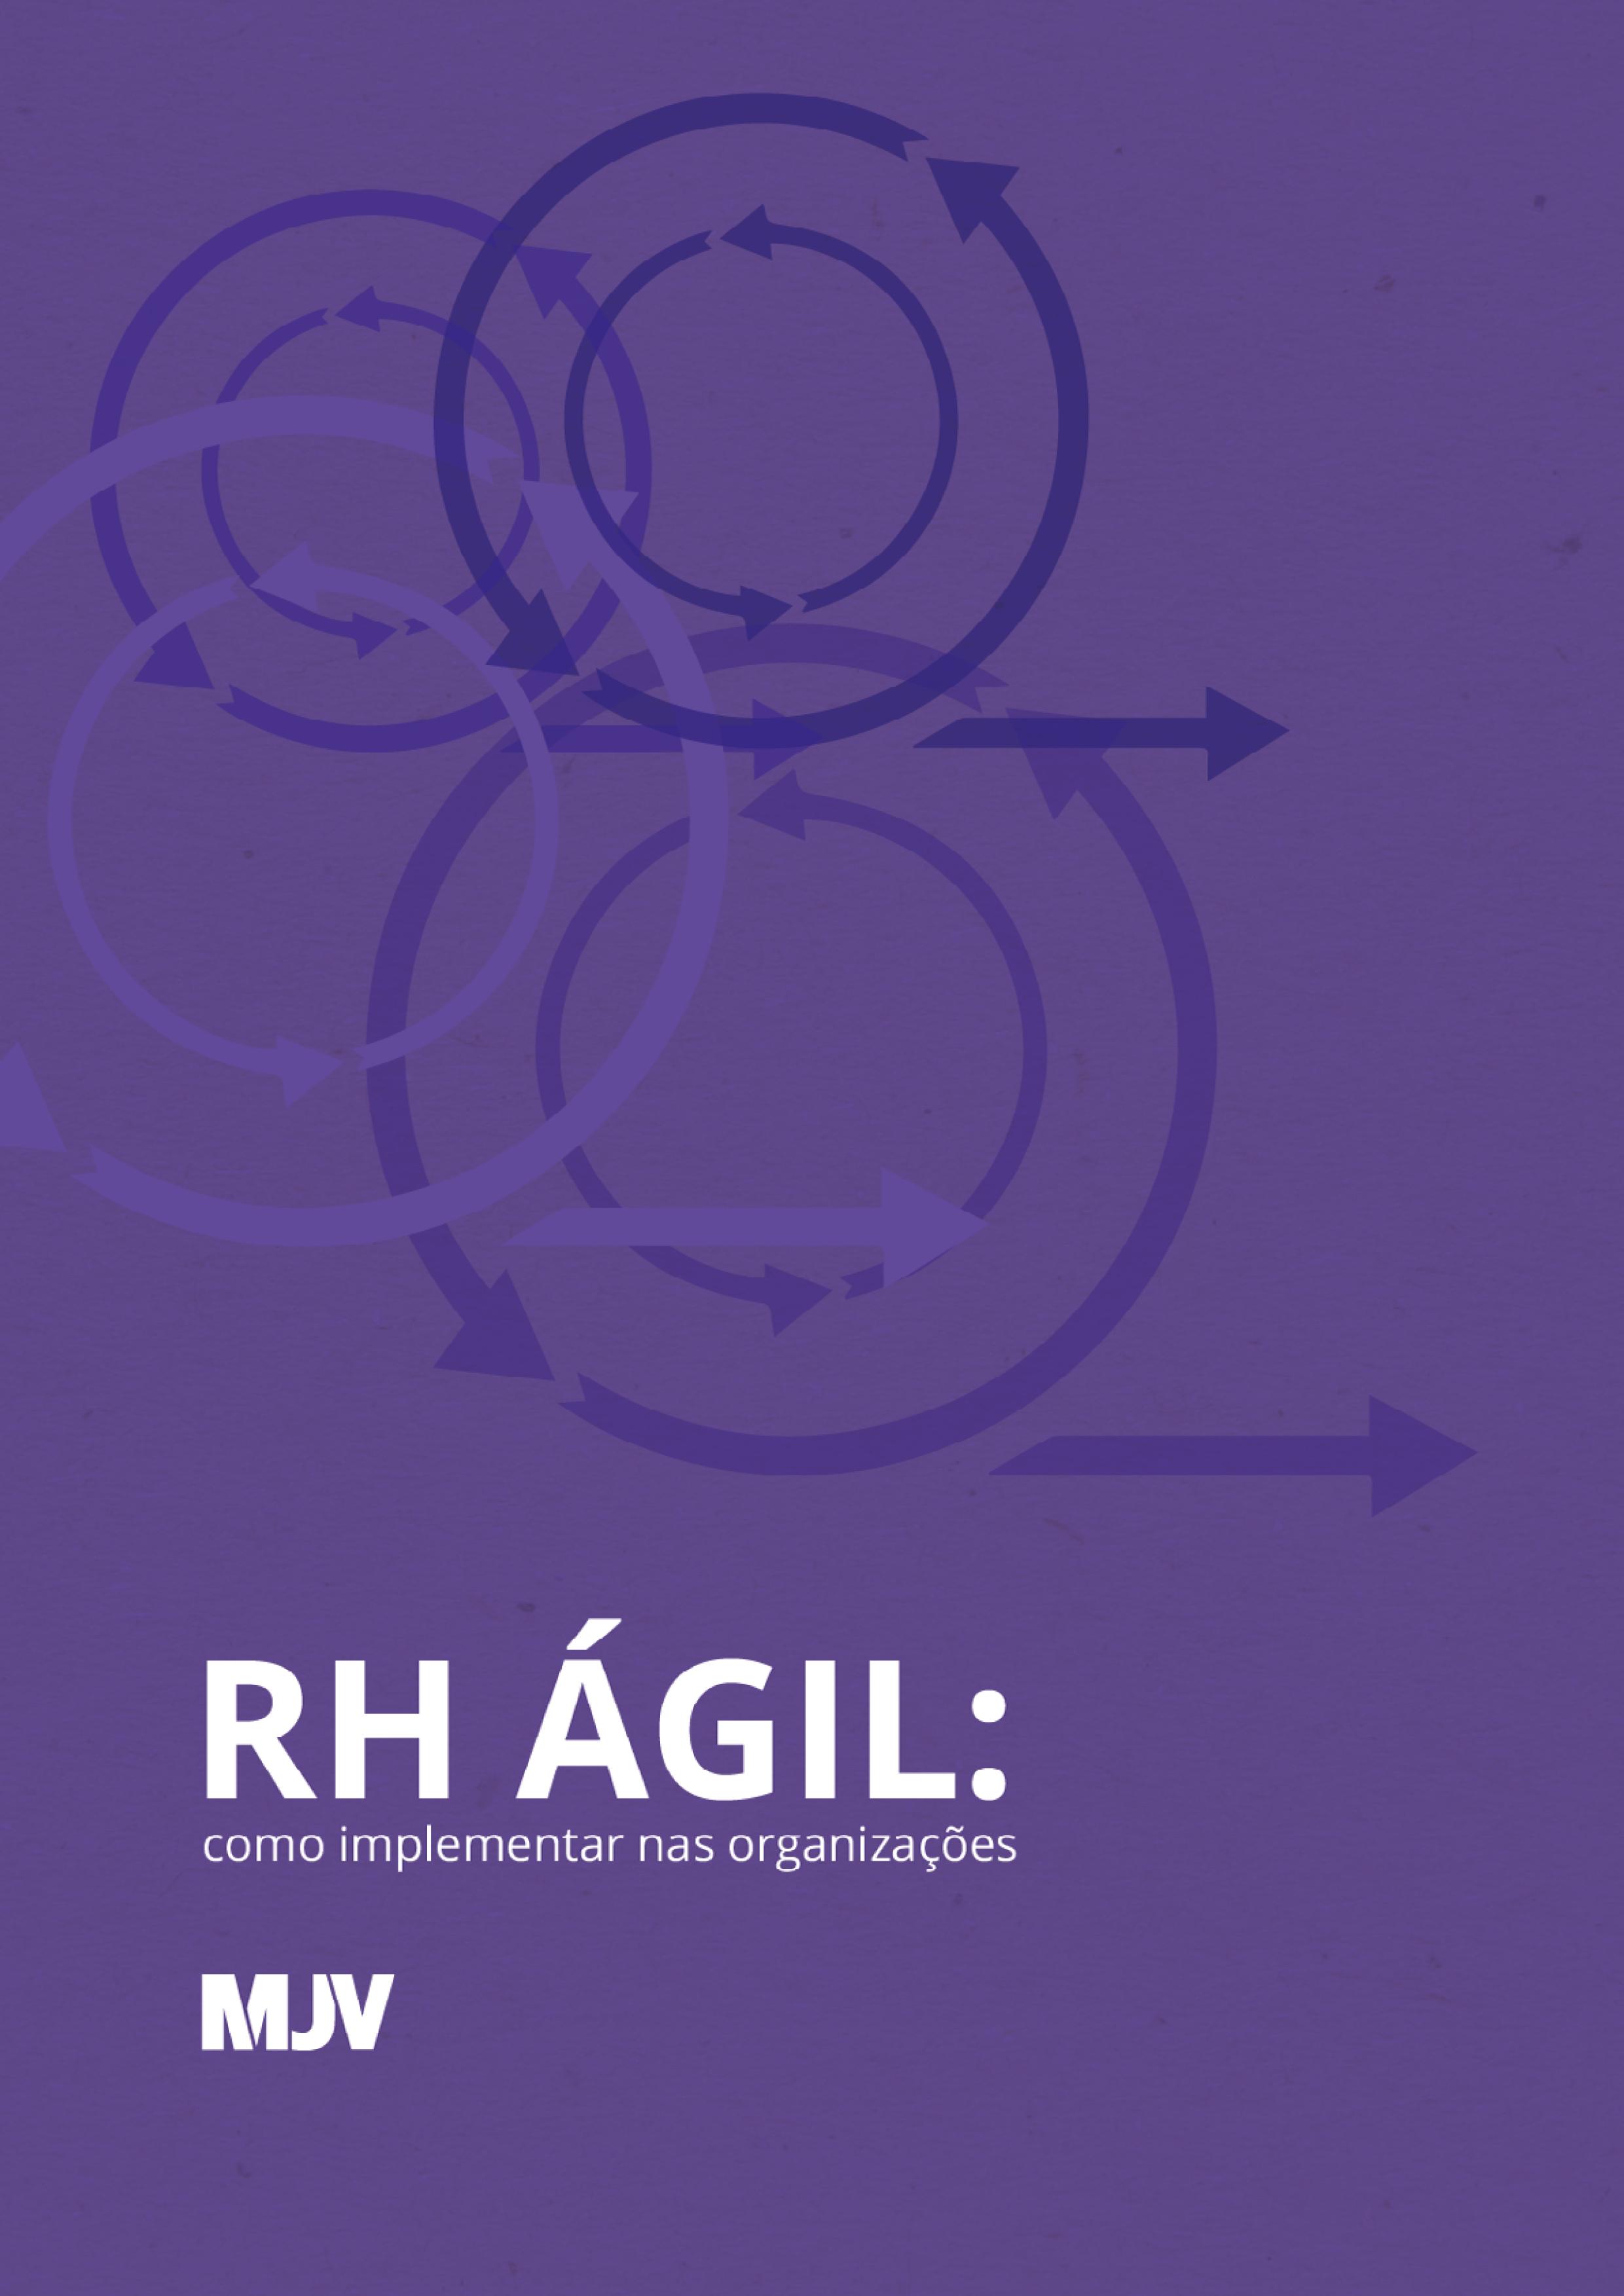 Rh-Agil-como-implementar-nas-organizacoes-1